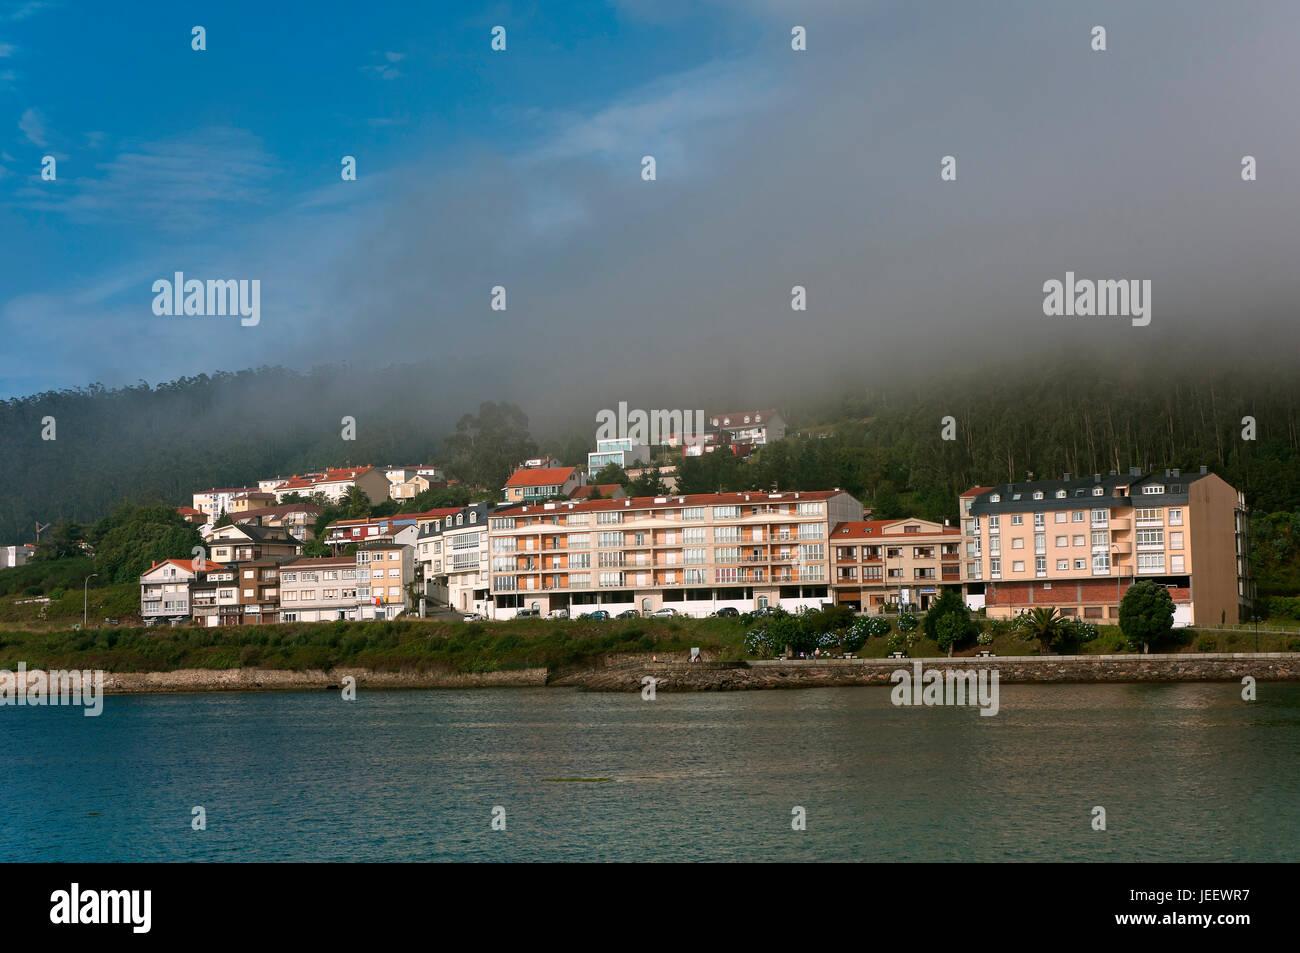 Fog in the estuary, Cee - Corcubion, La Coruna province, Region of Galicia, Spain, Europe - Stock Image